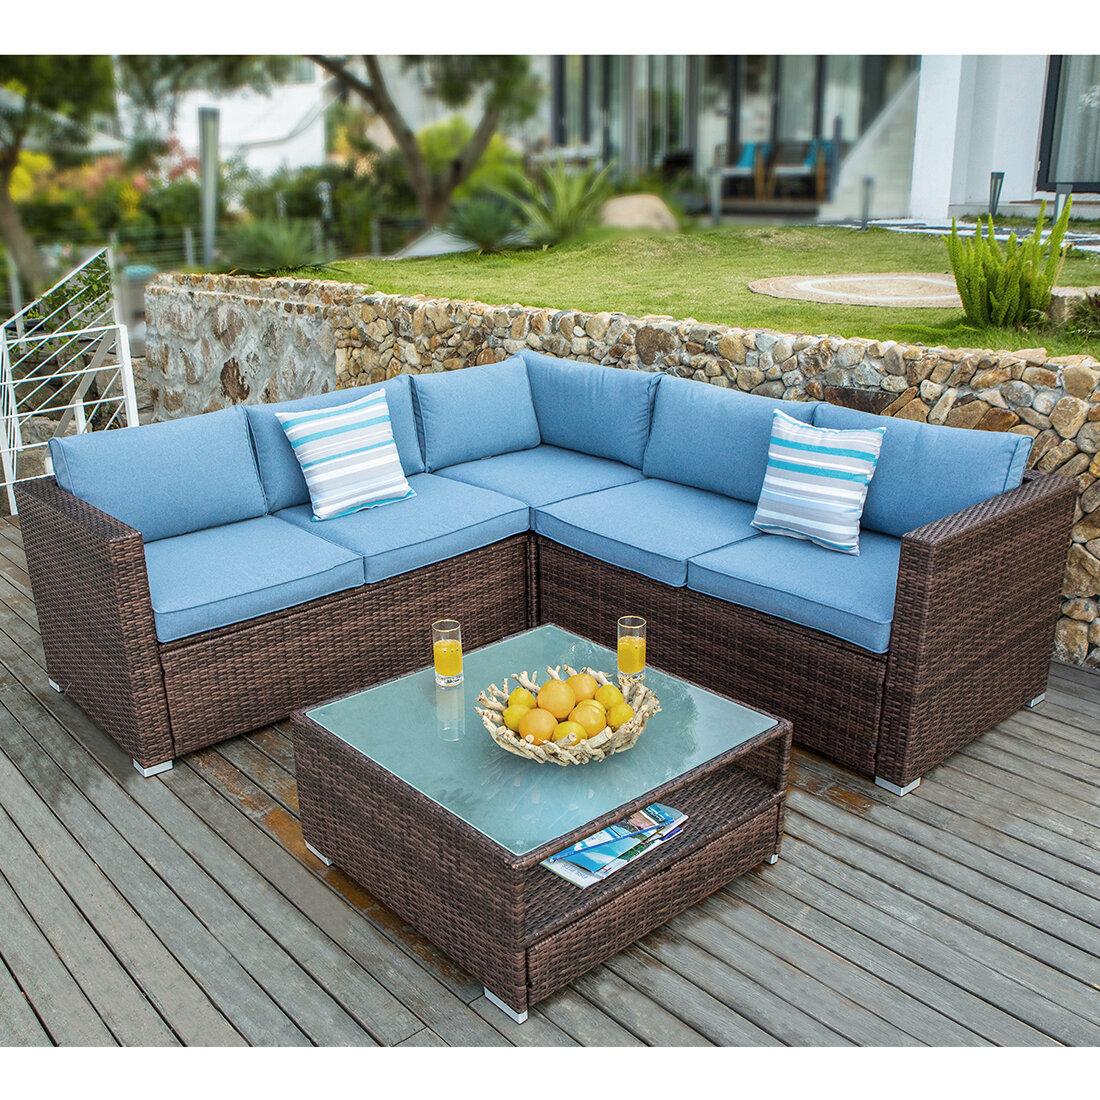 Bayou Breeze Kyle 4 Piece Rattan Sectional Seating Group With Cushions Reviews Wayfair